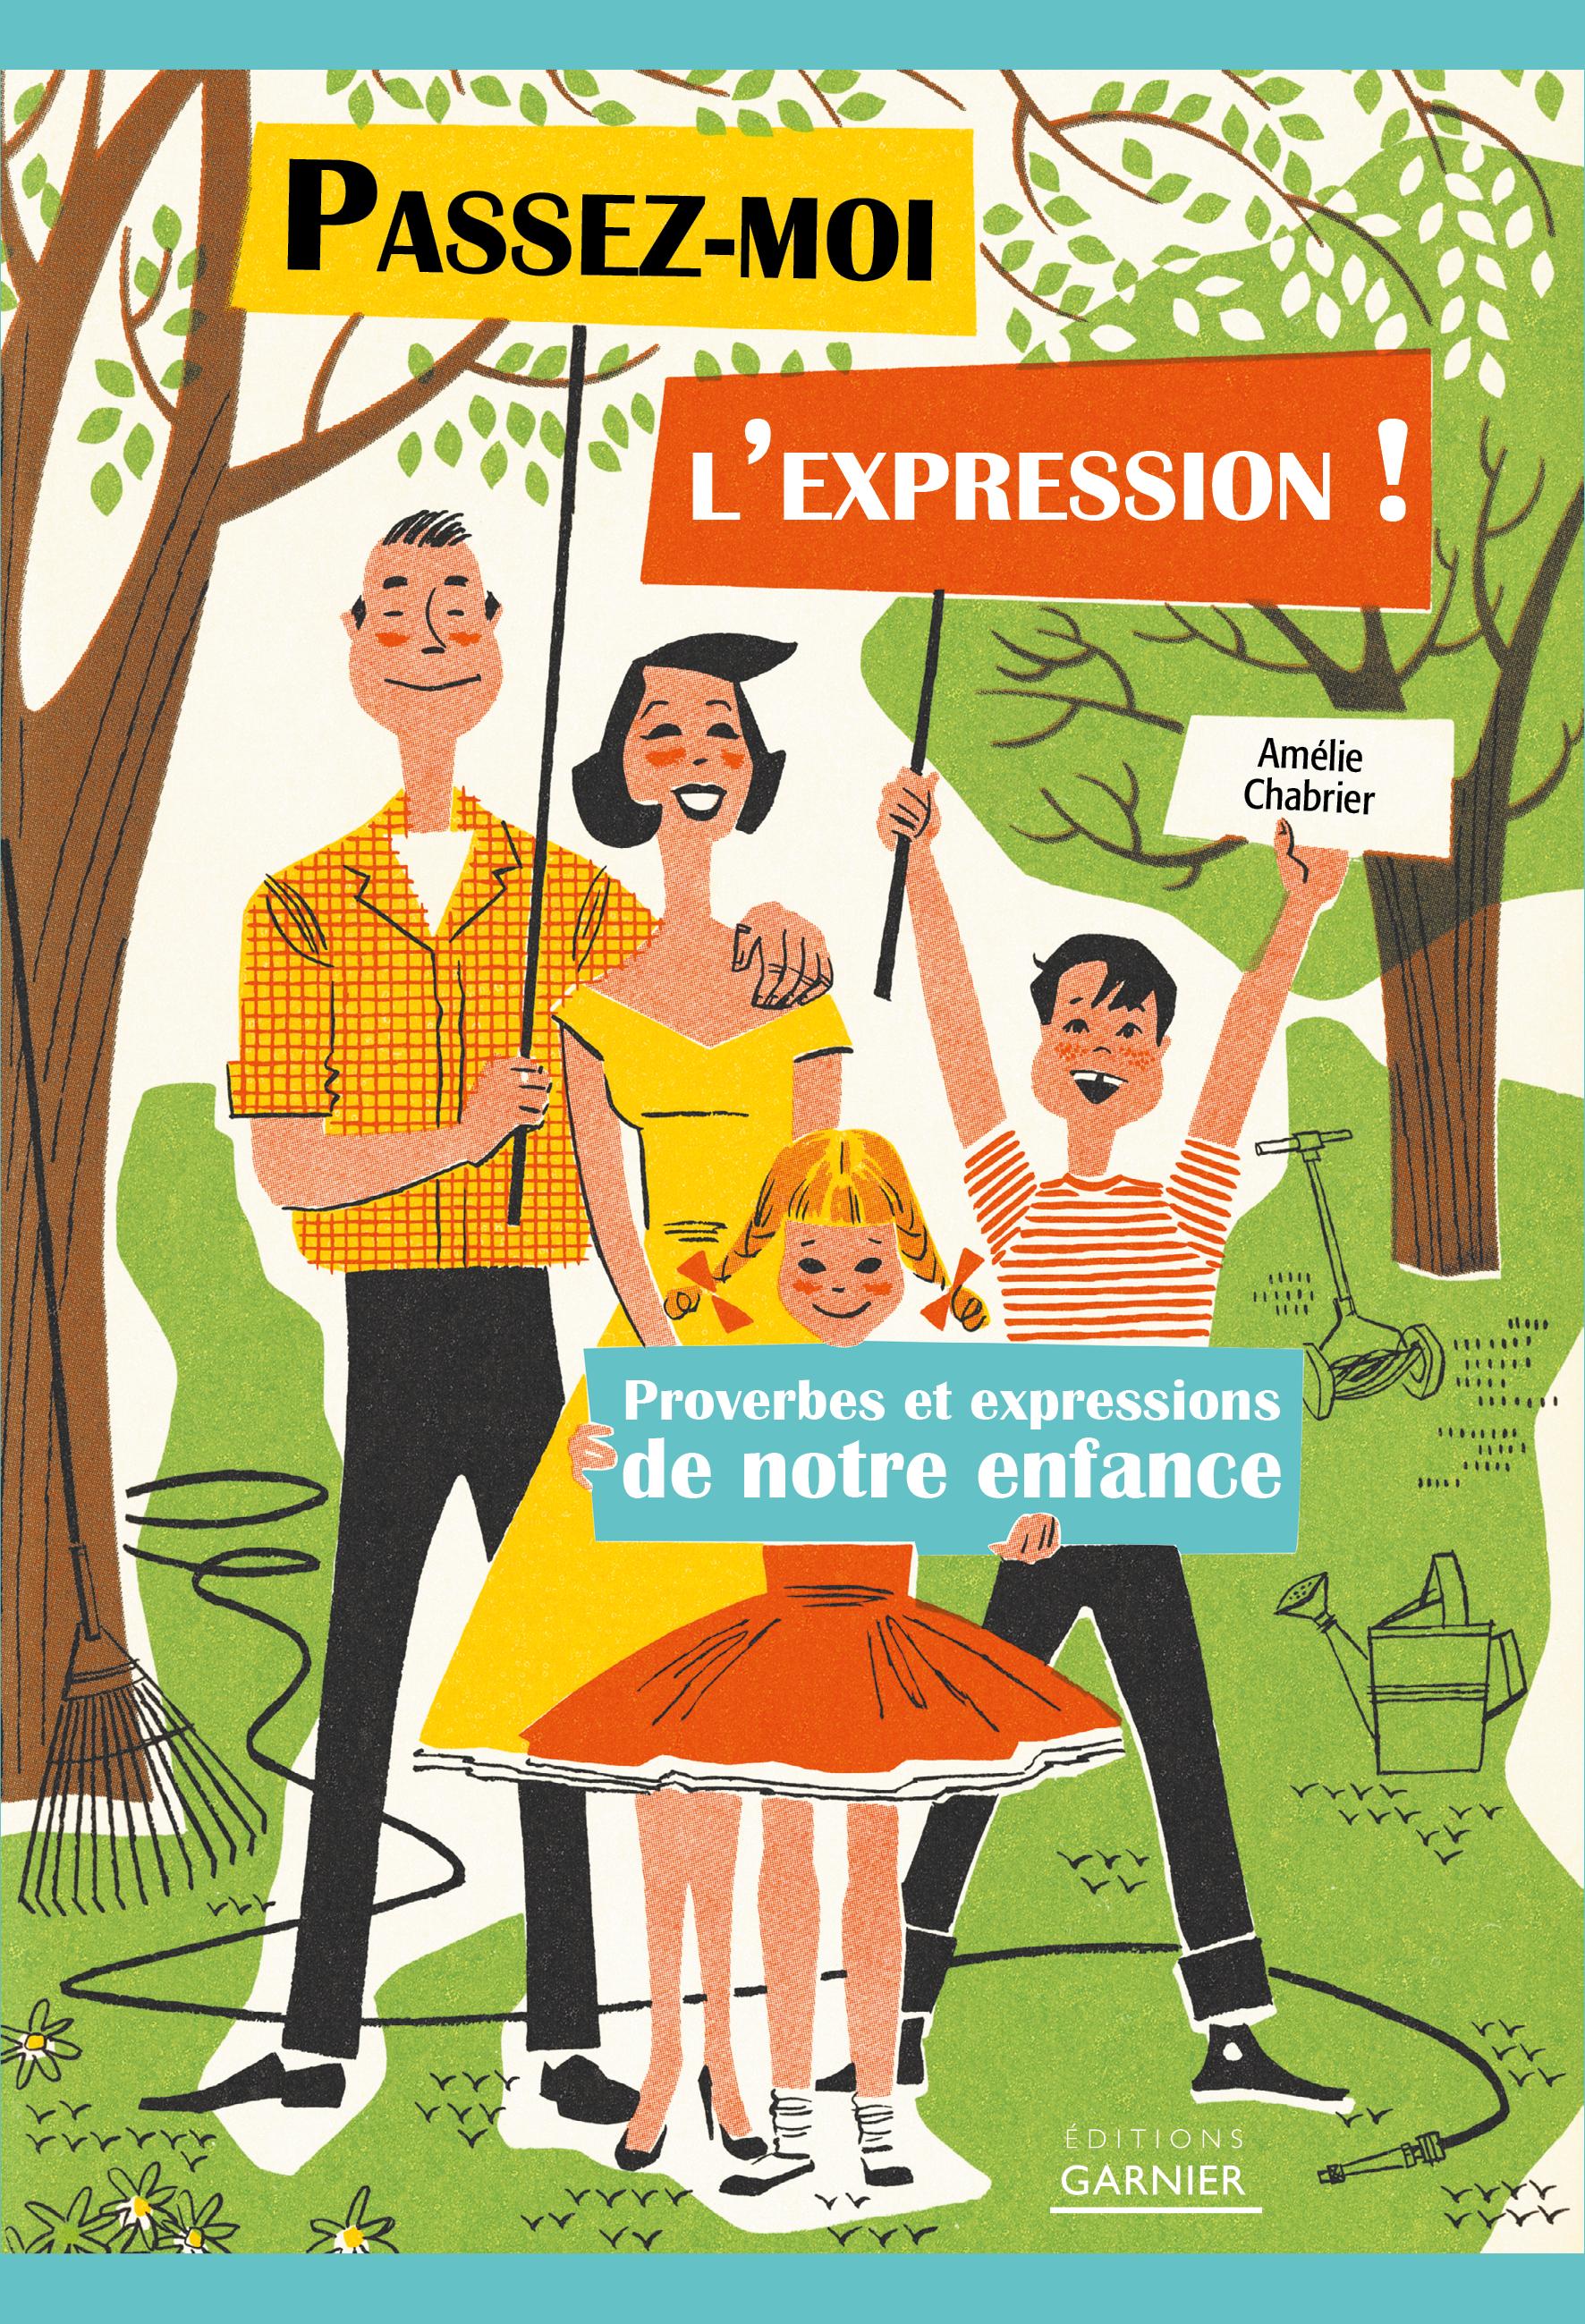 PASSEZ-MOI L'EXPRESSION !